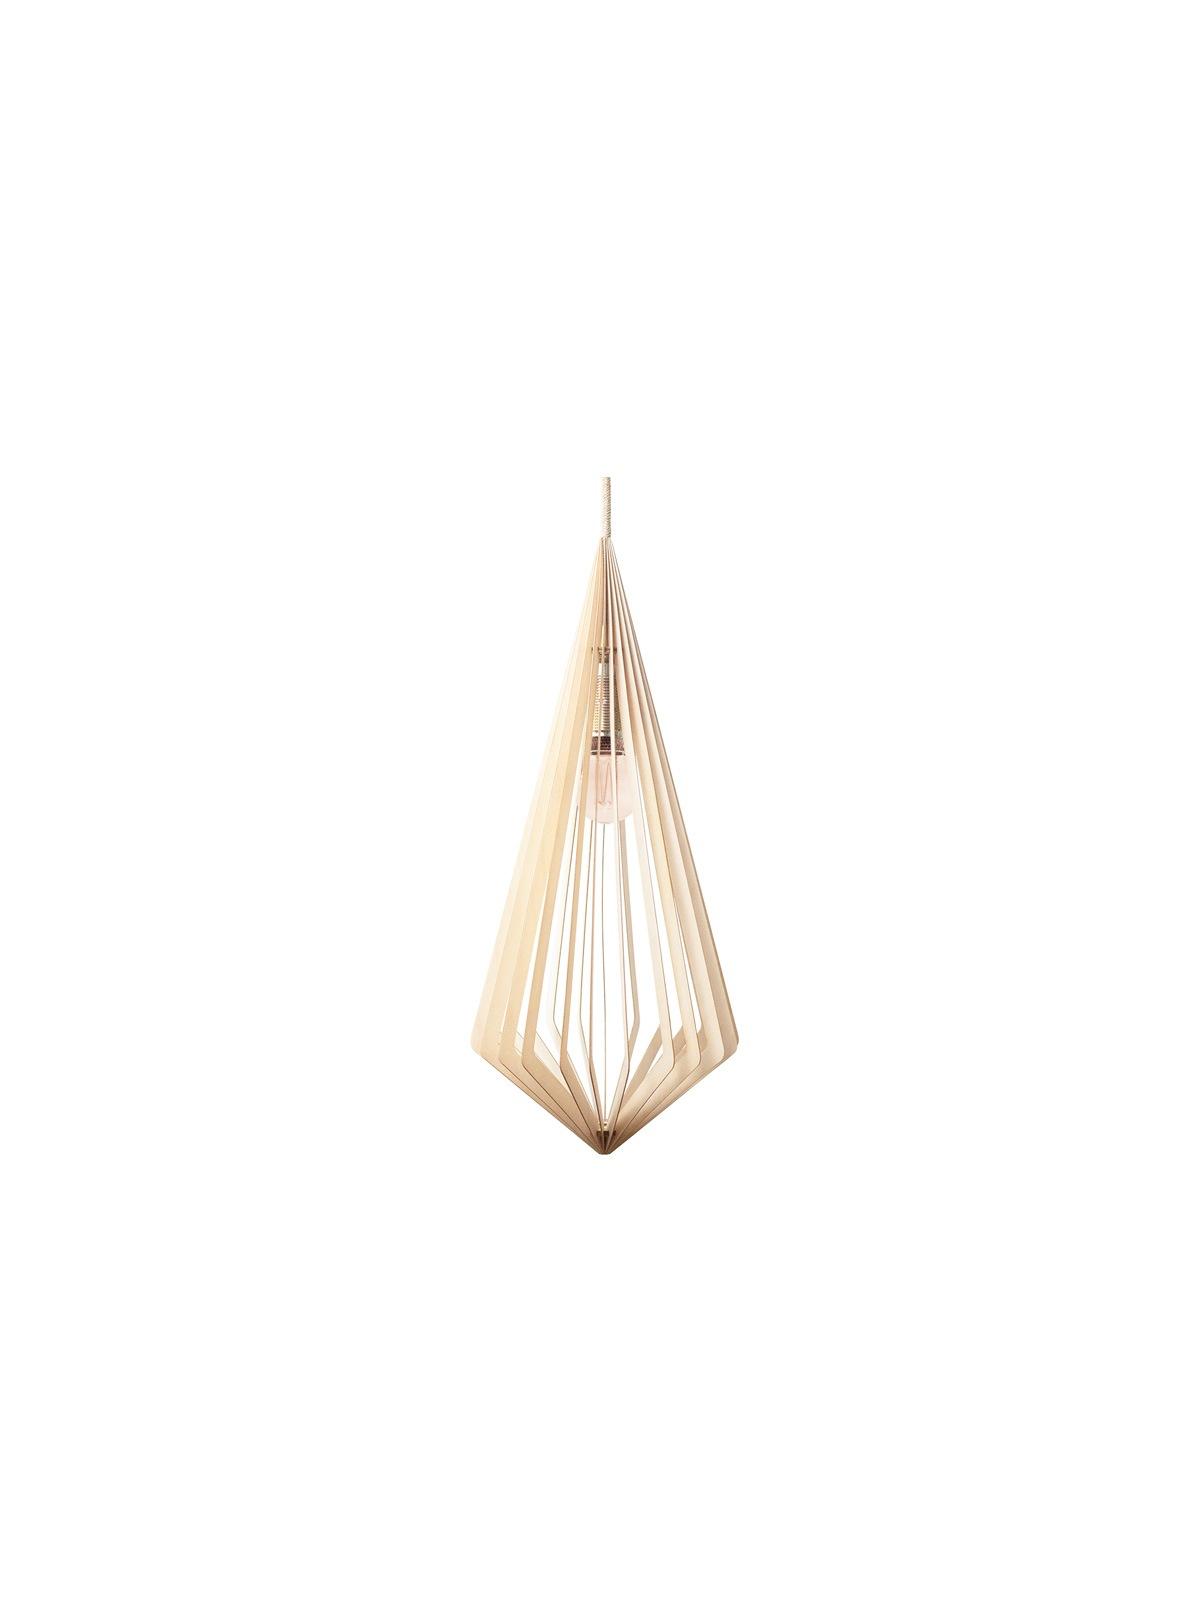 MAERU Maari Pendel Leuchte Holz Designort Lampen Leuchten Berlin